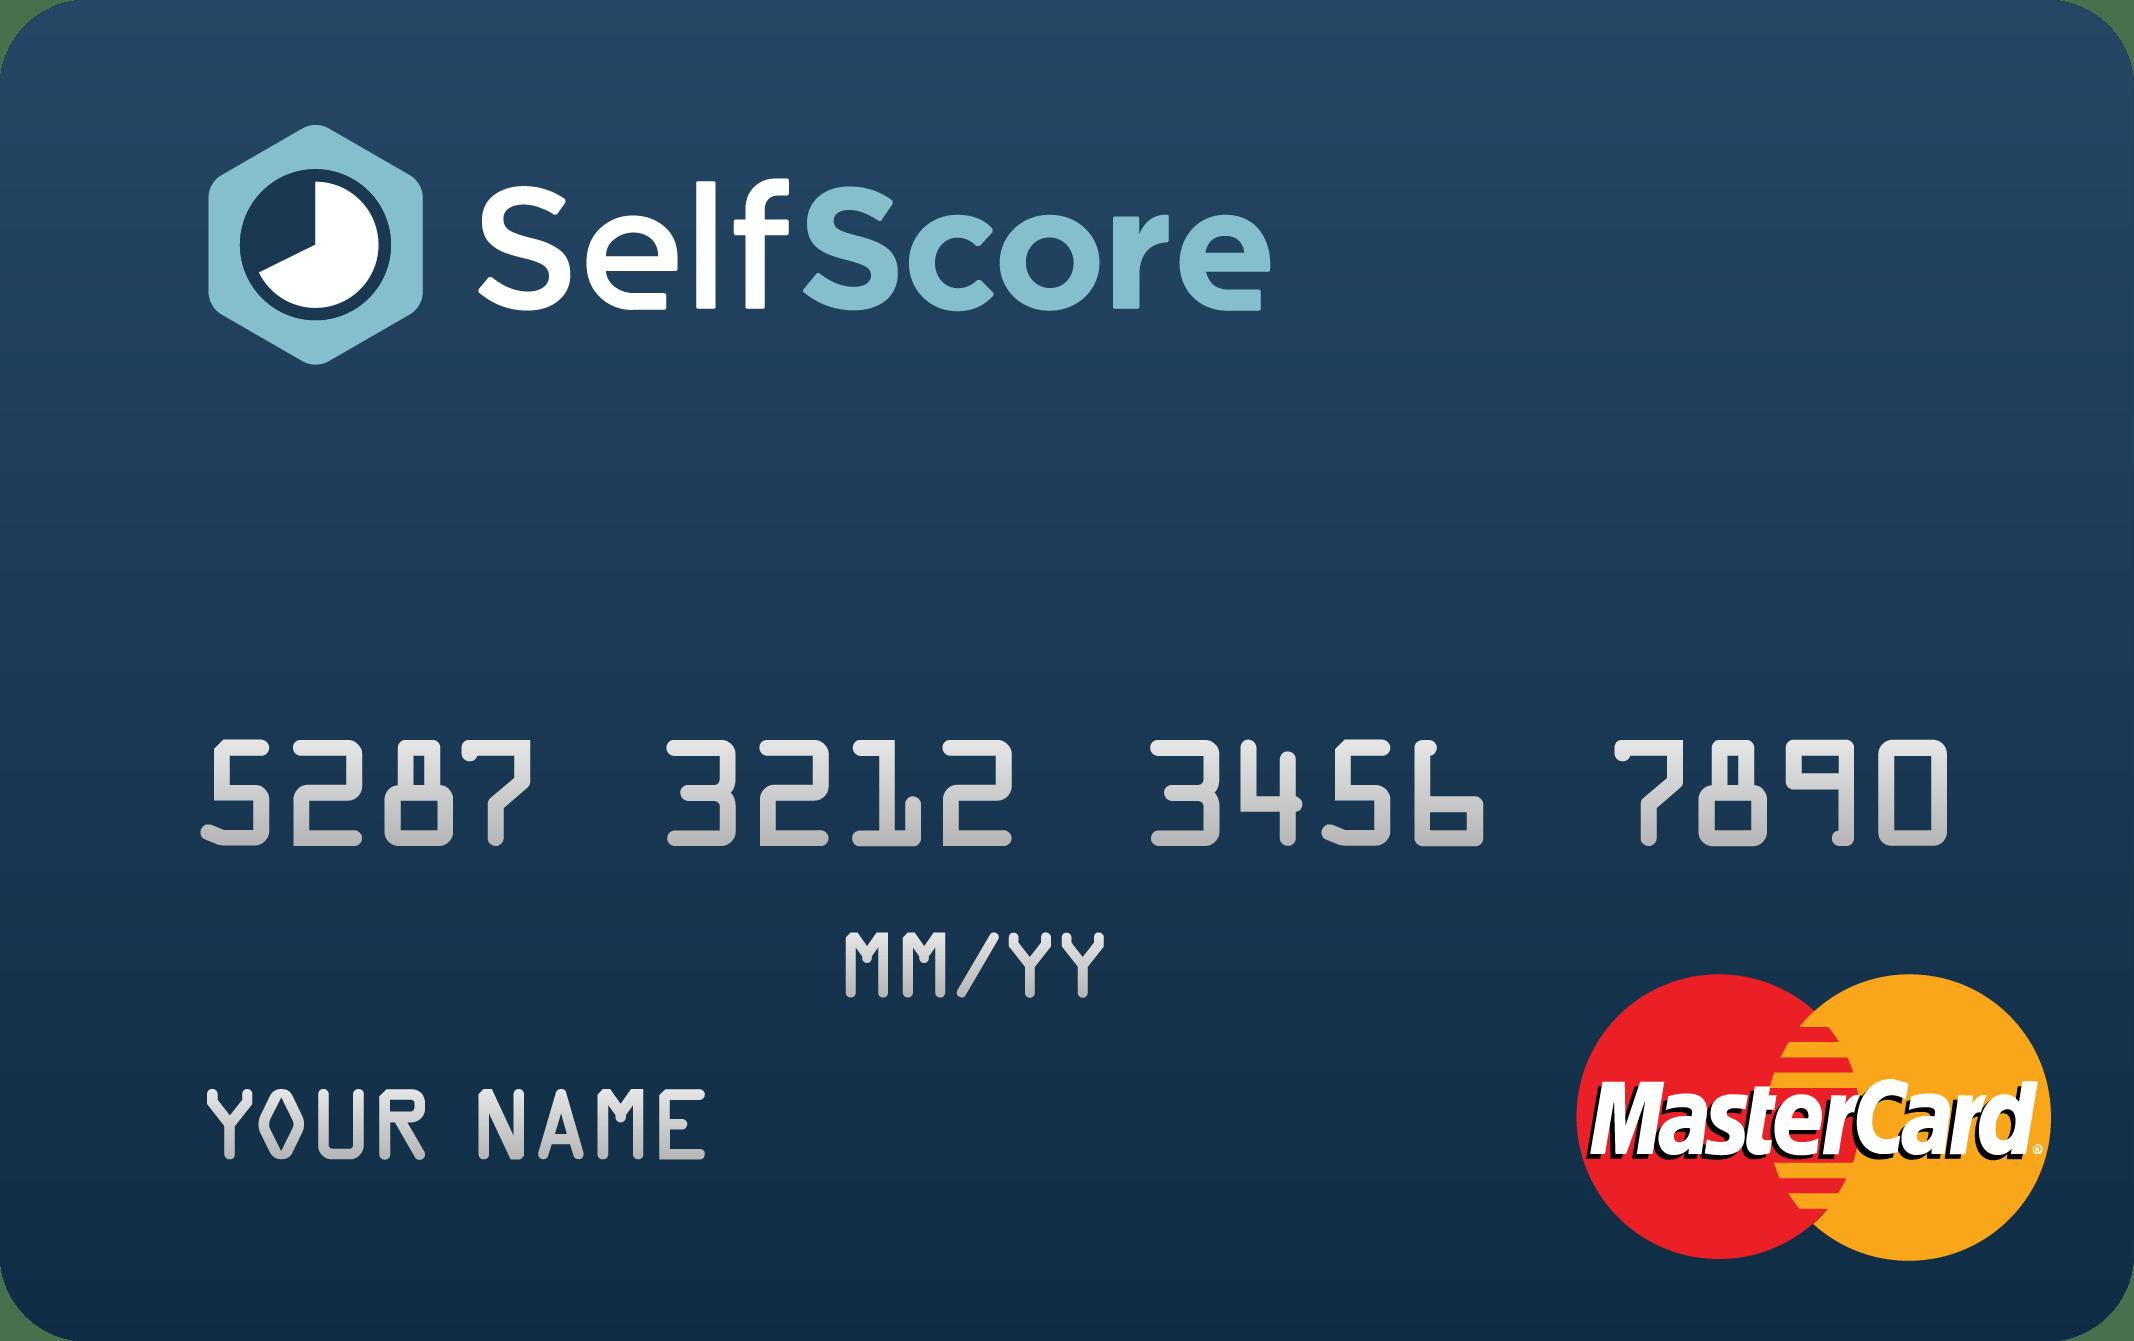 selfscore classic mastercard 2017 10 update selfscore is now